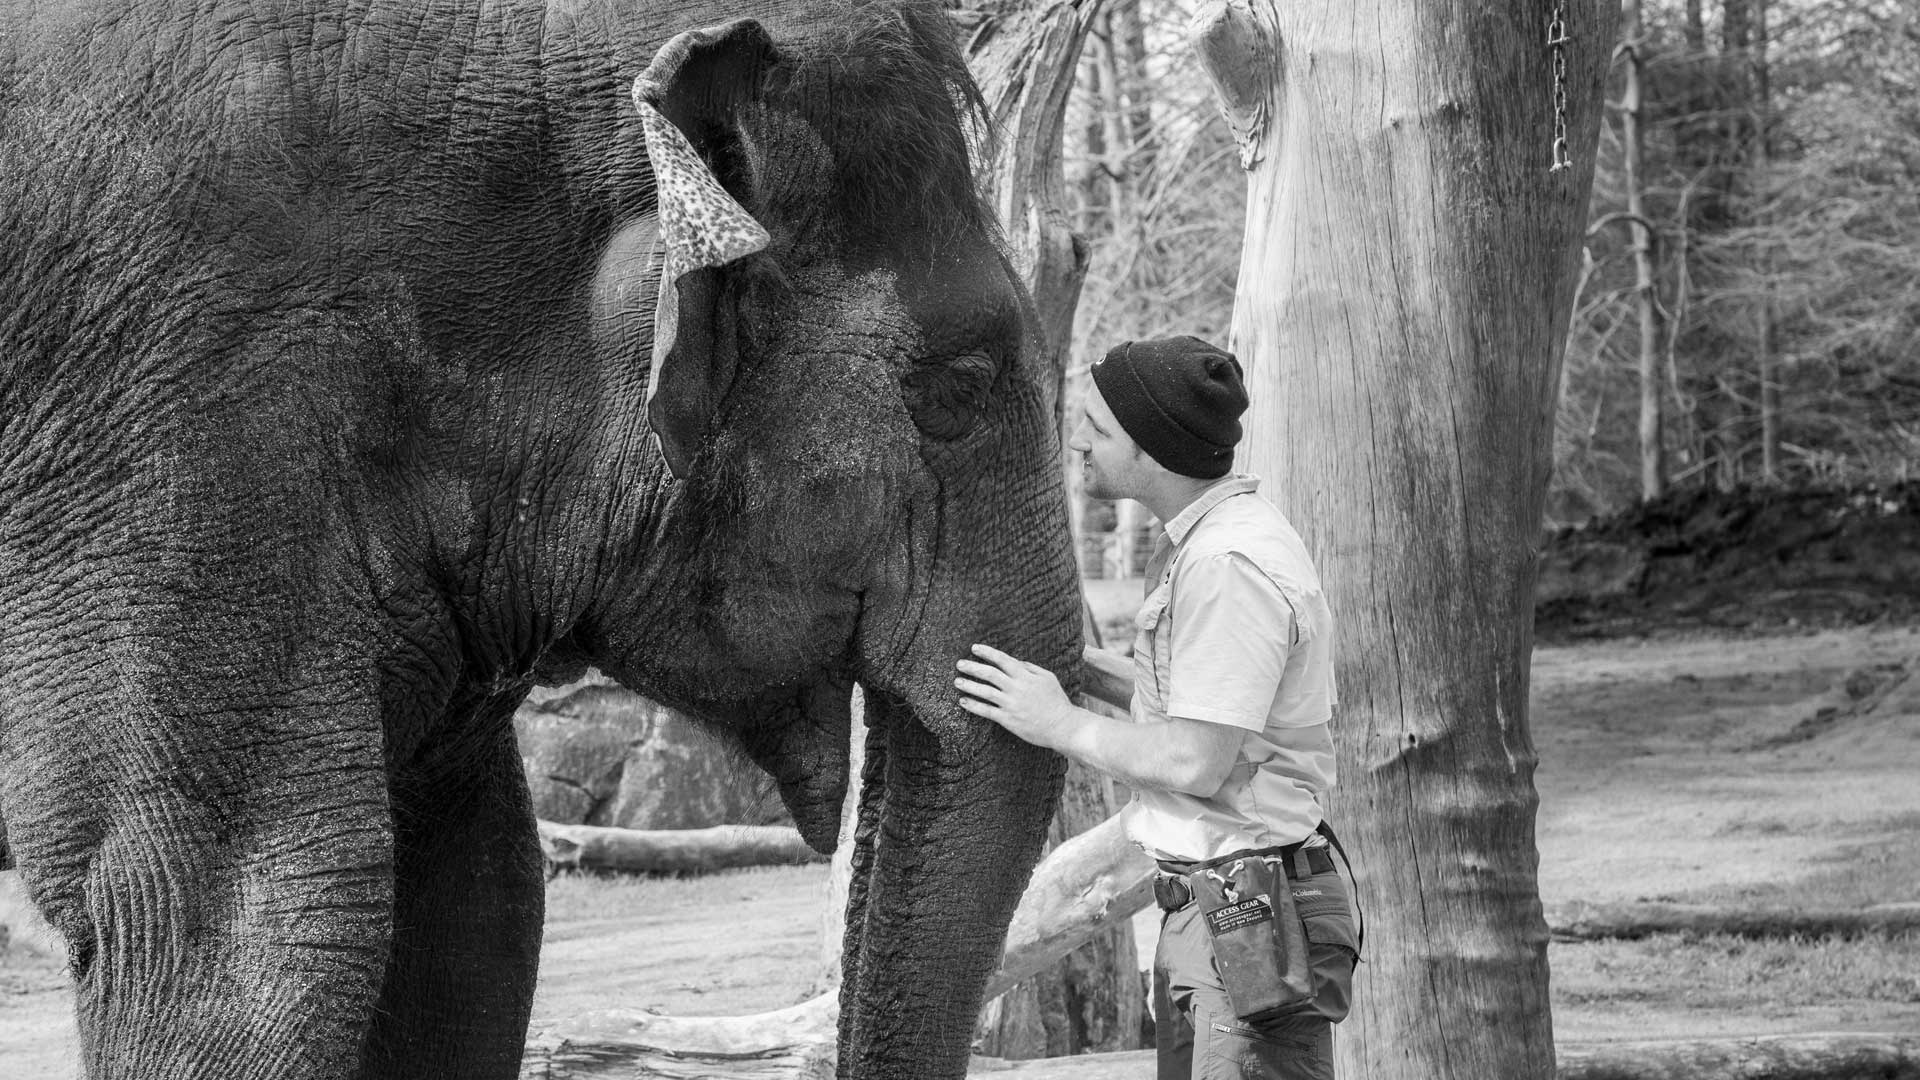 https://rfacdn.nz/zoo/assets/media/world-elephant-day-gallery-7.jpg